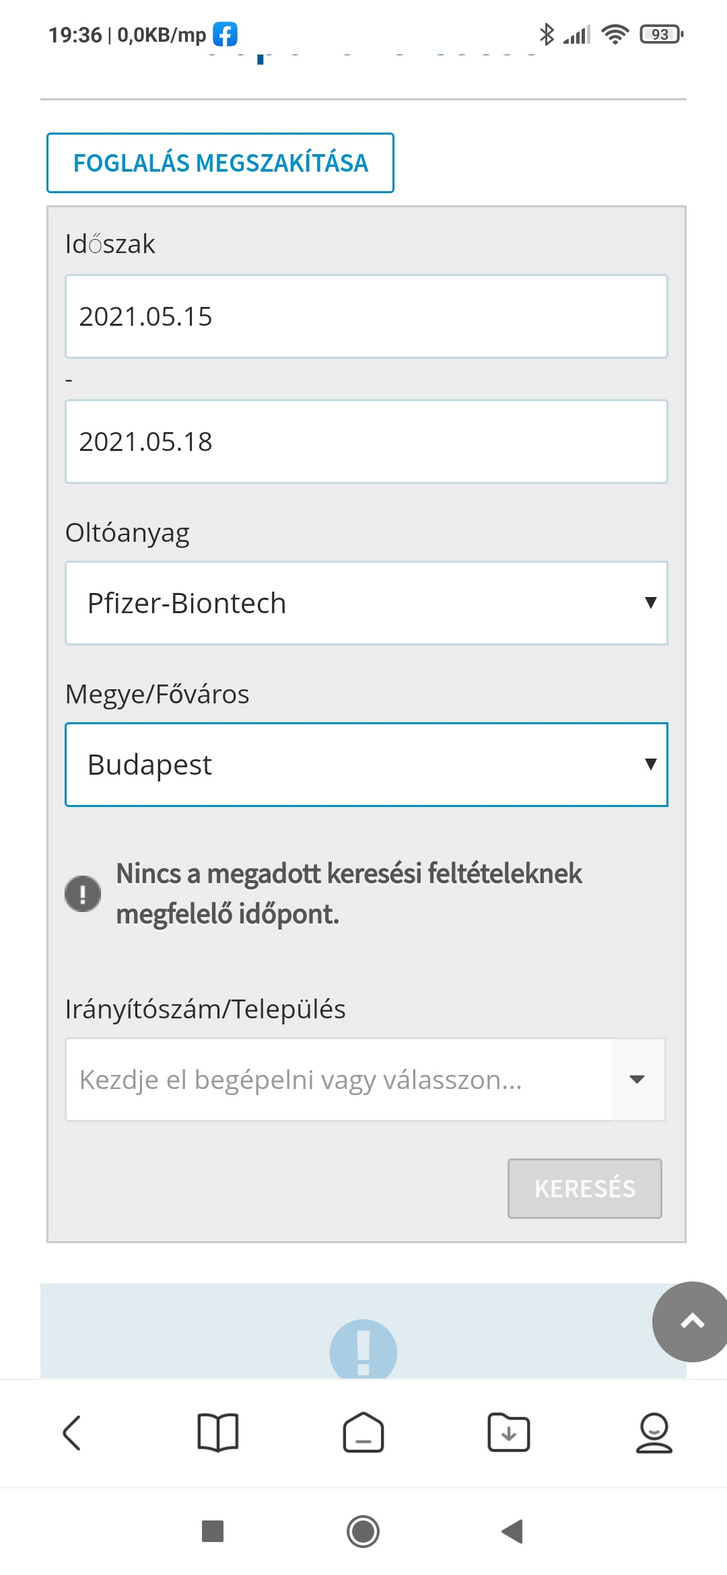 Screenshot 2021-05-15-19-36-02-846 com.mi.globalbrowser